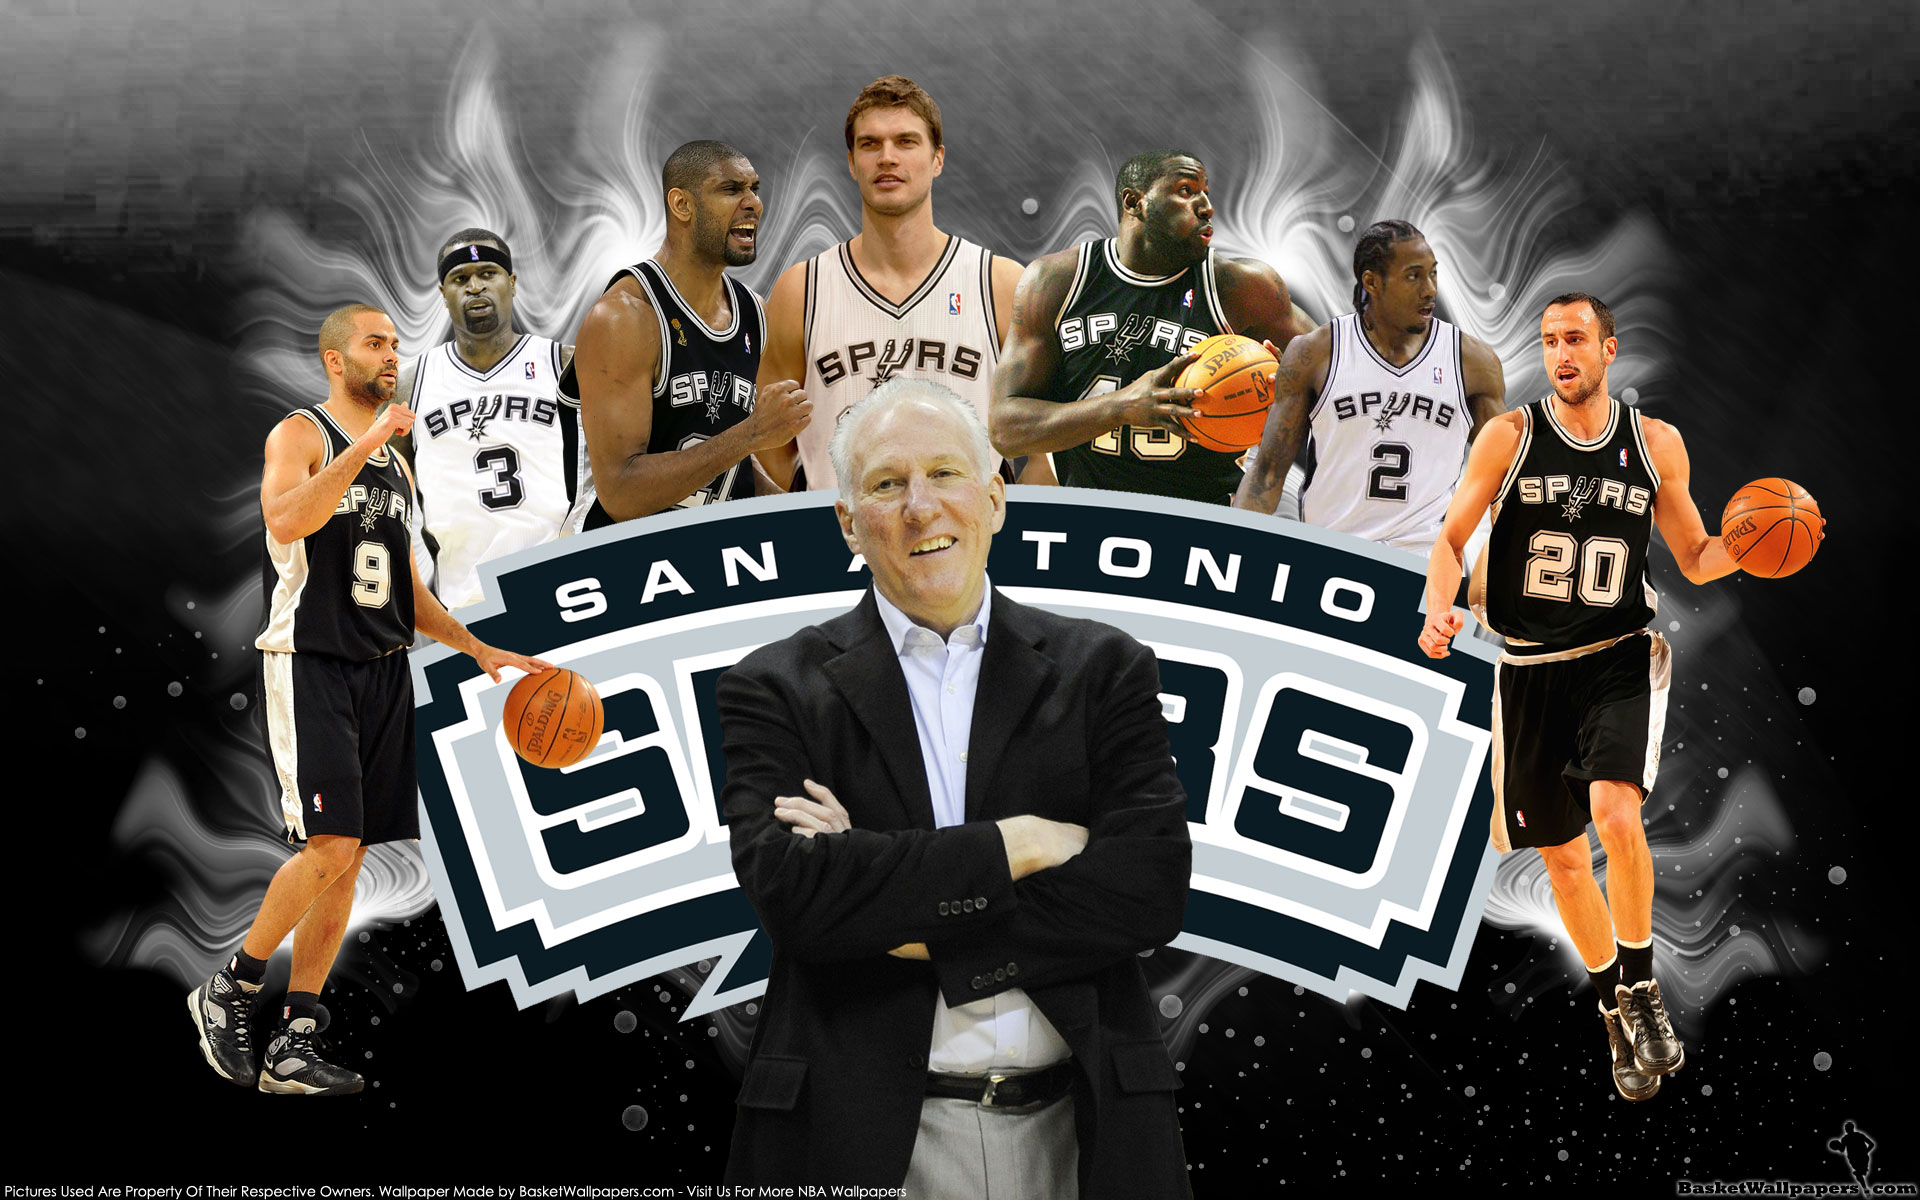 San Antonio Spurs 2013 19201200 101650 HD Wallpaper Res 1920x1200 1920x1200